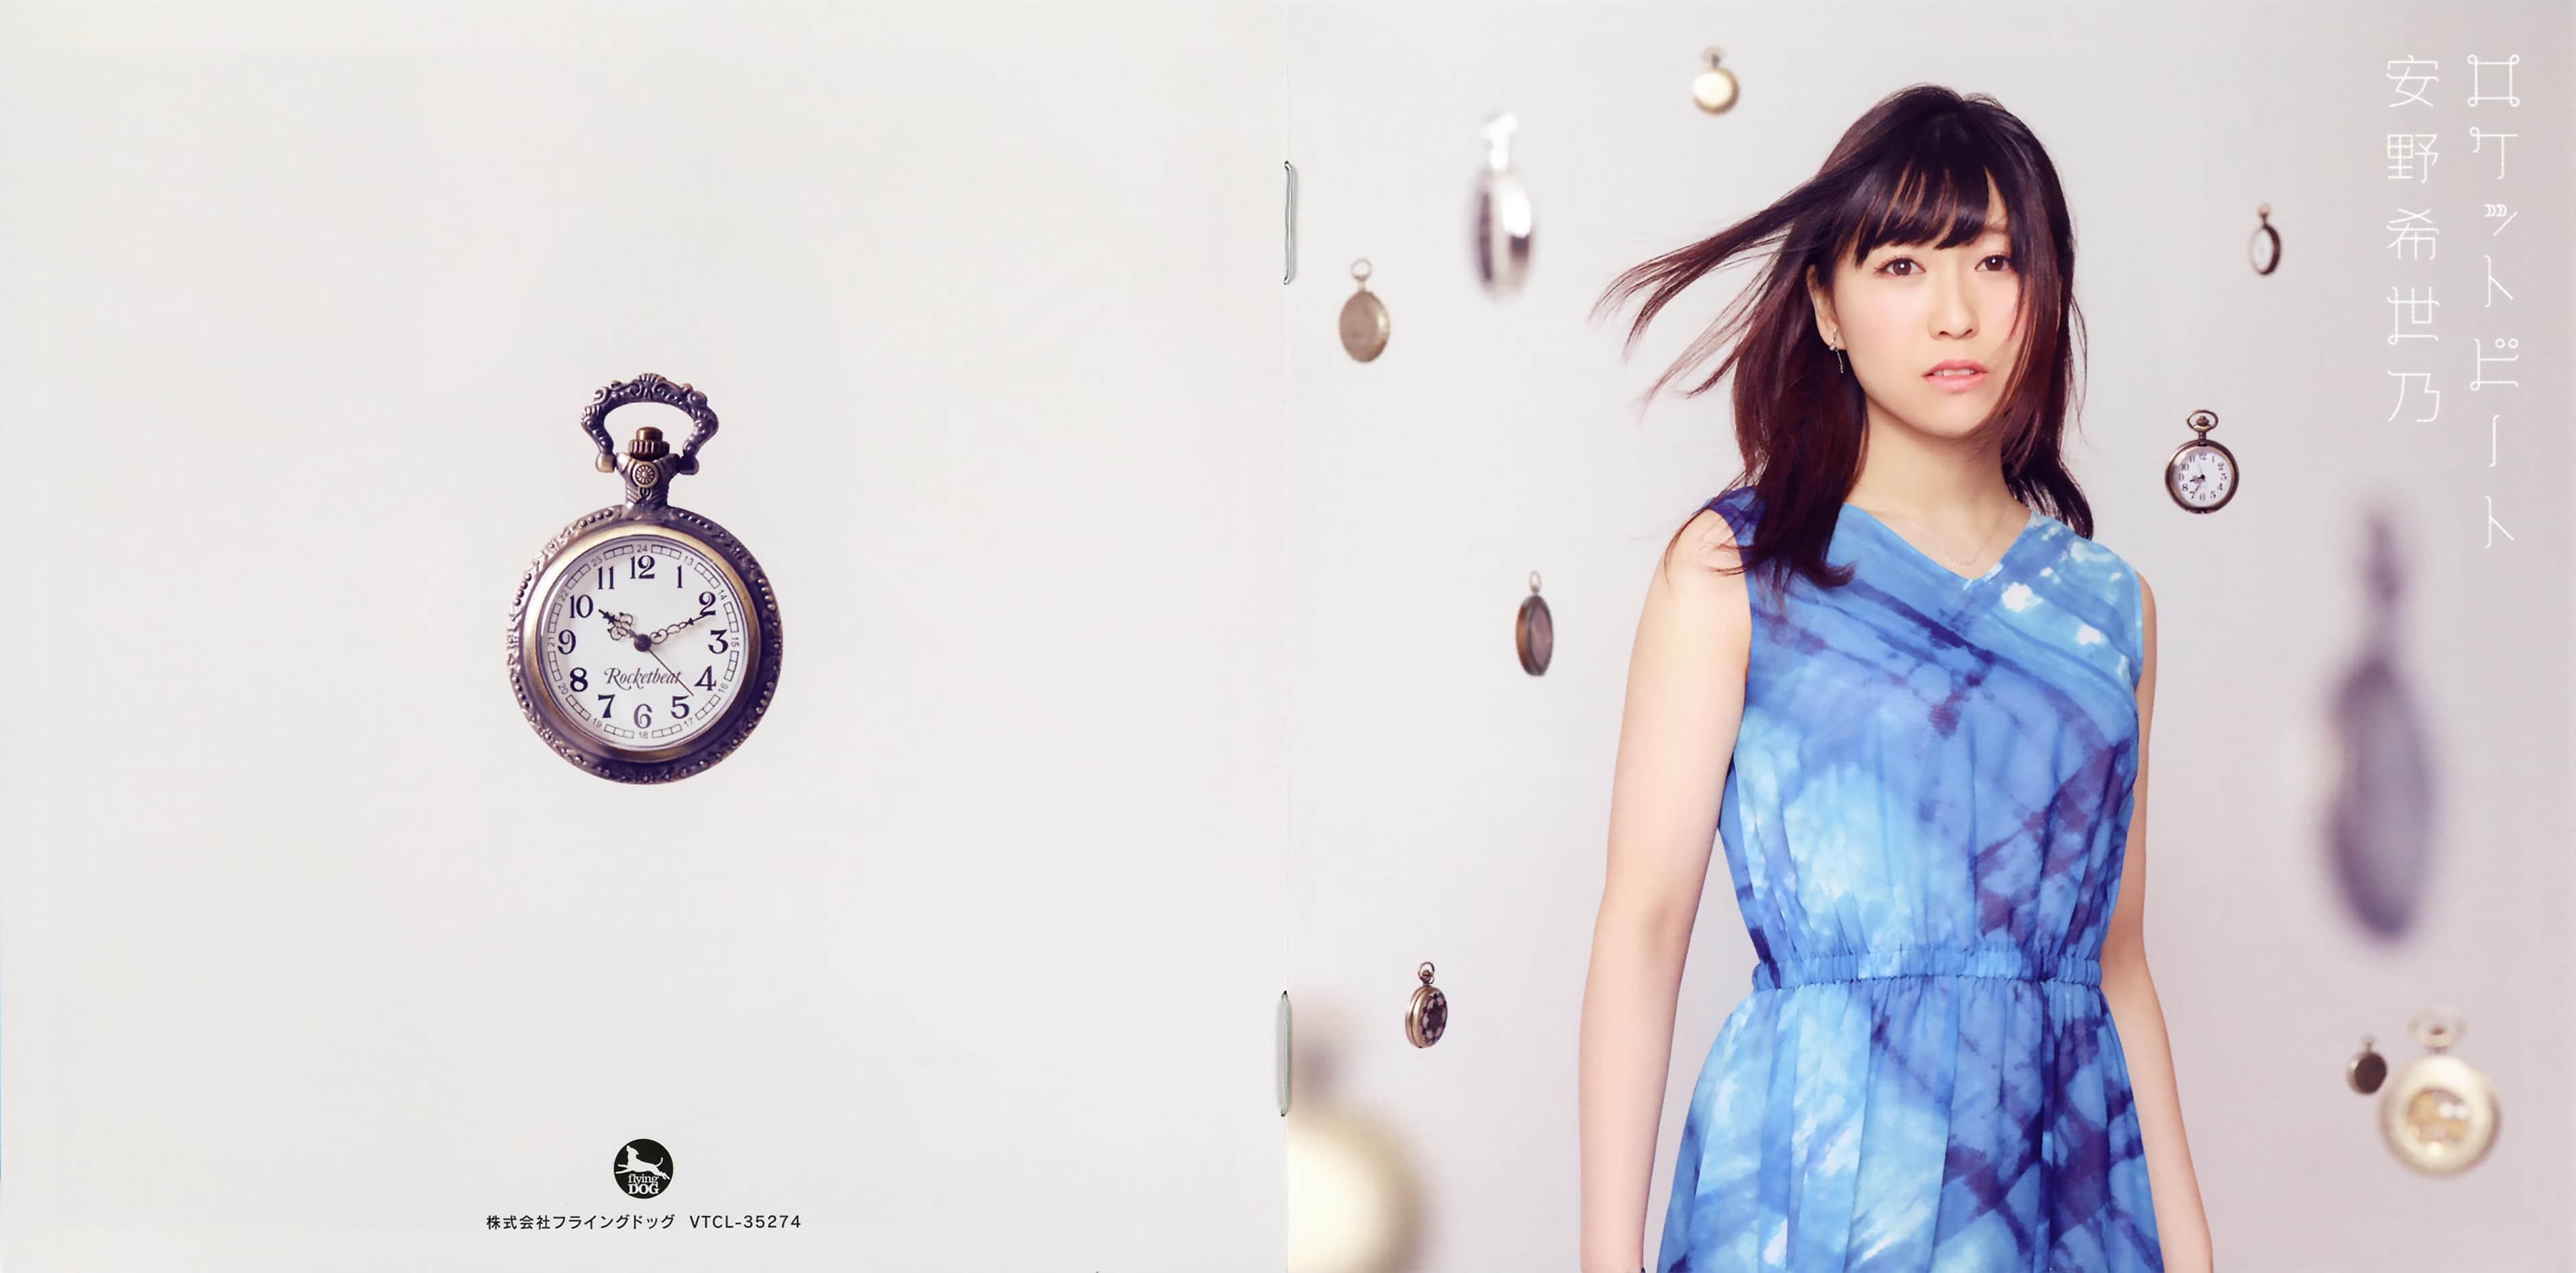 Kiyono Yasuno rocket beat cd cover & video musical